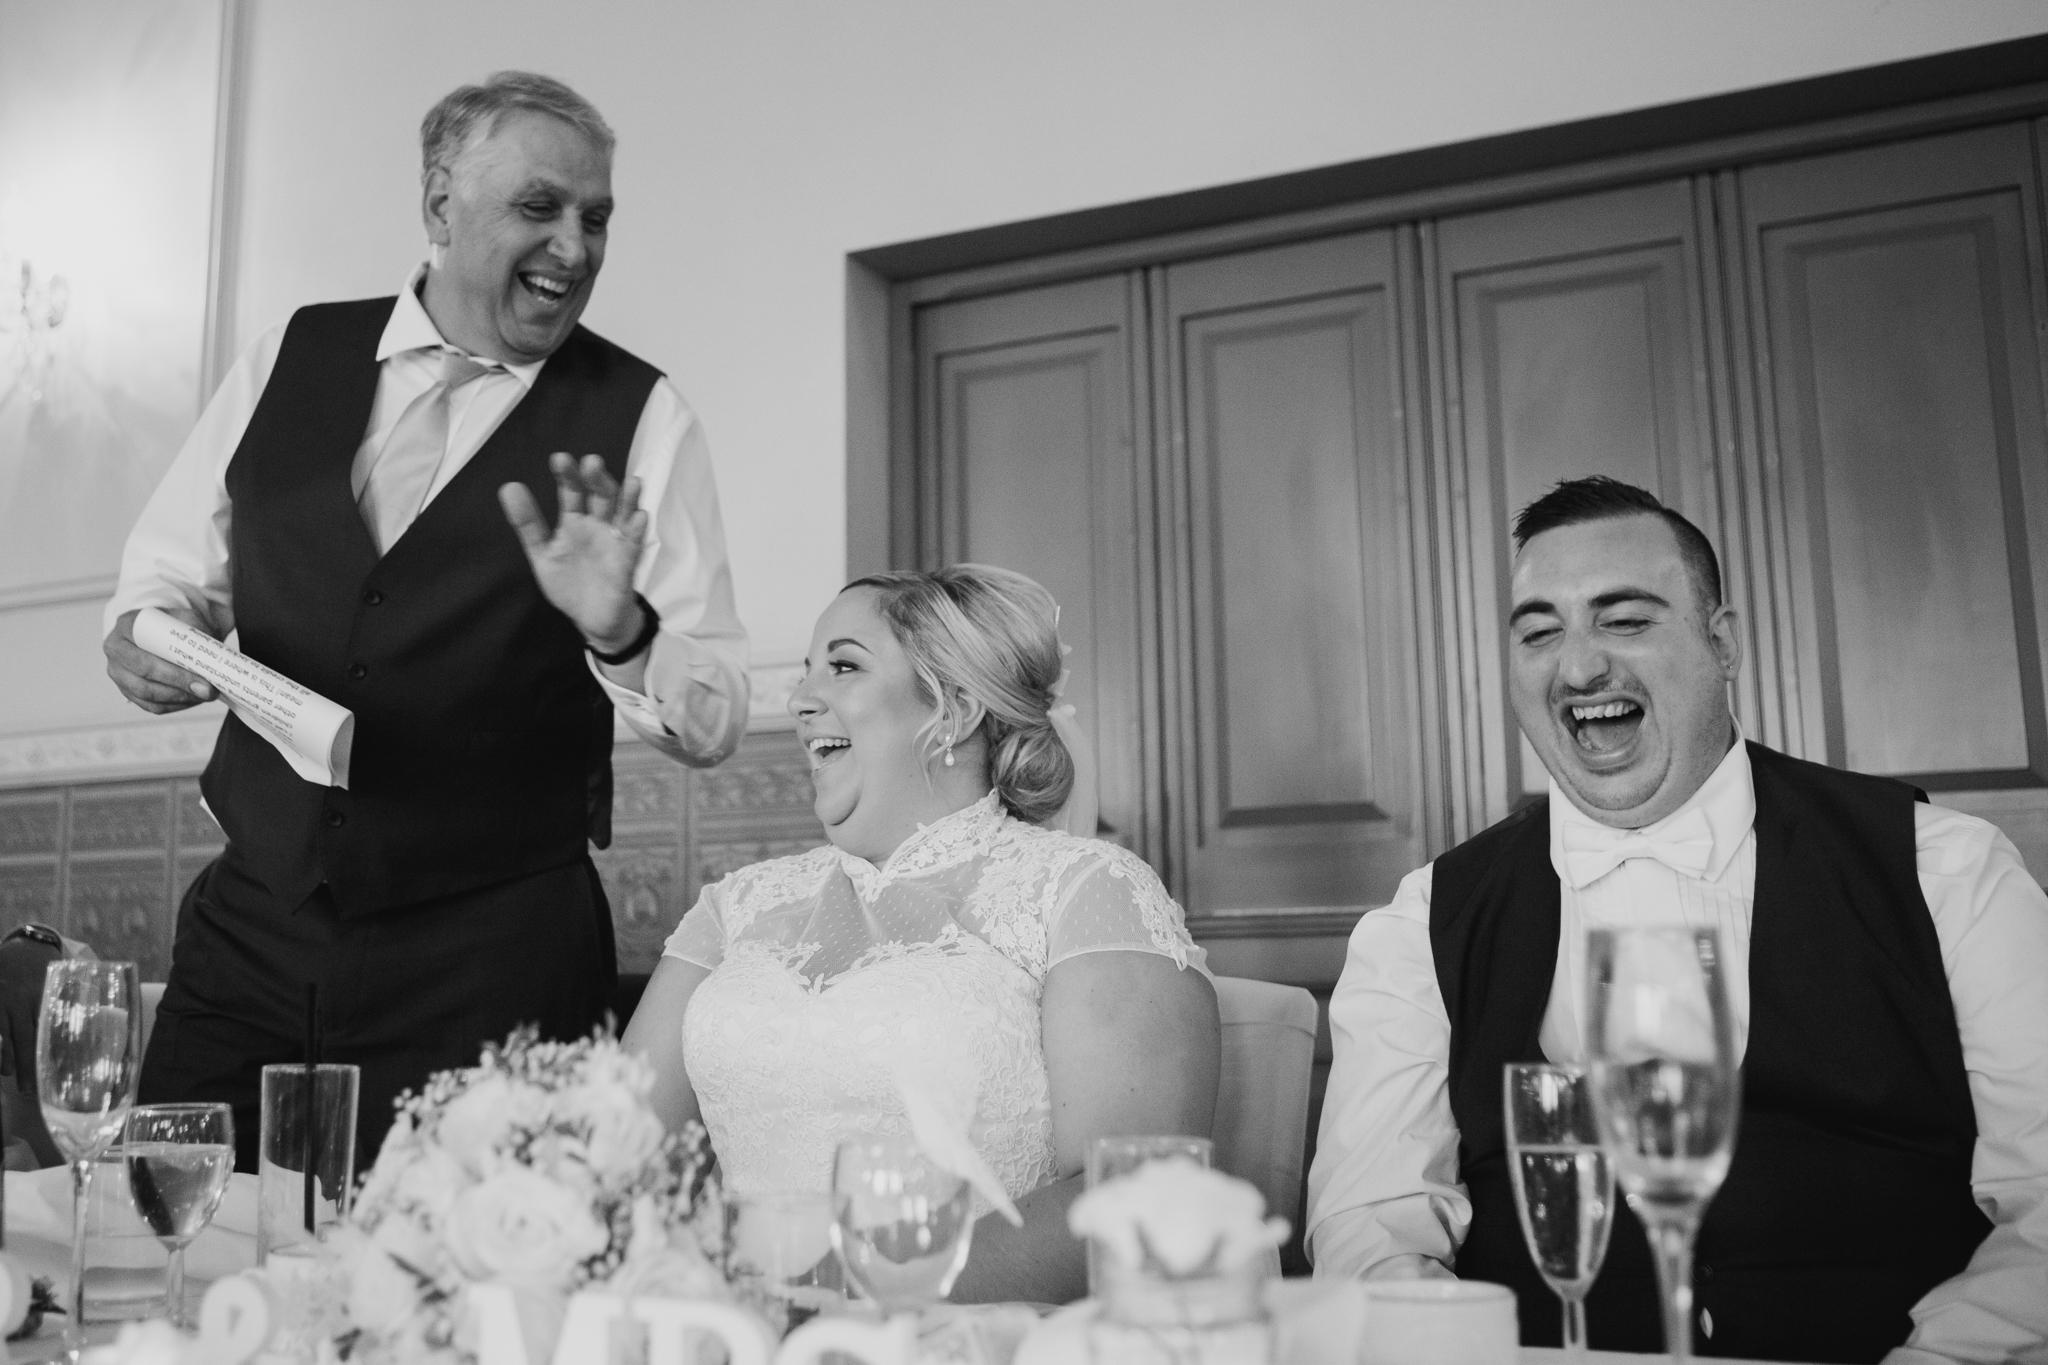 North Devon Wedding Photographer Woolacombe bay hotel 010.jpg